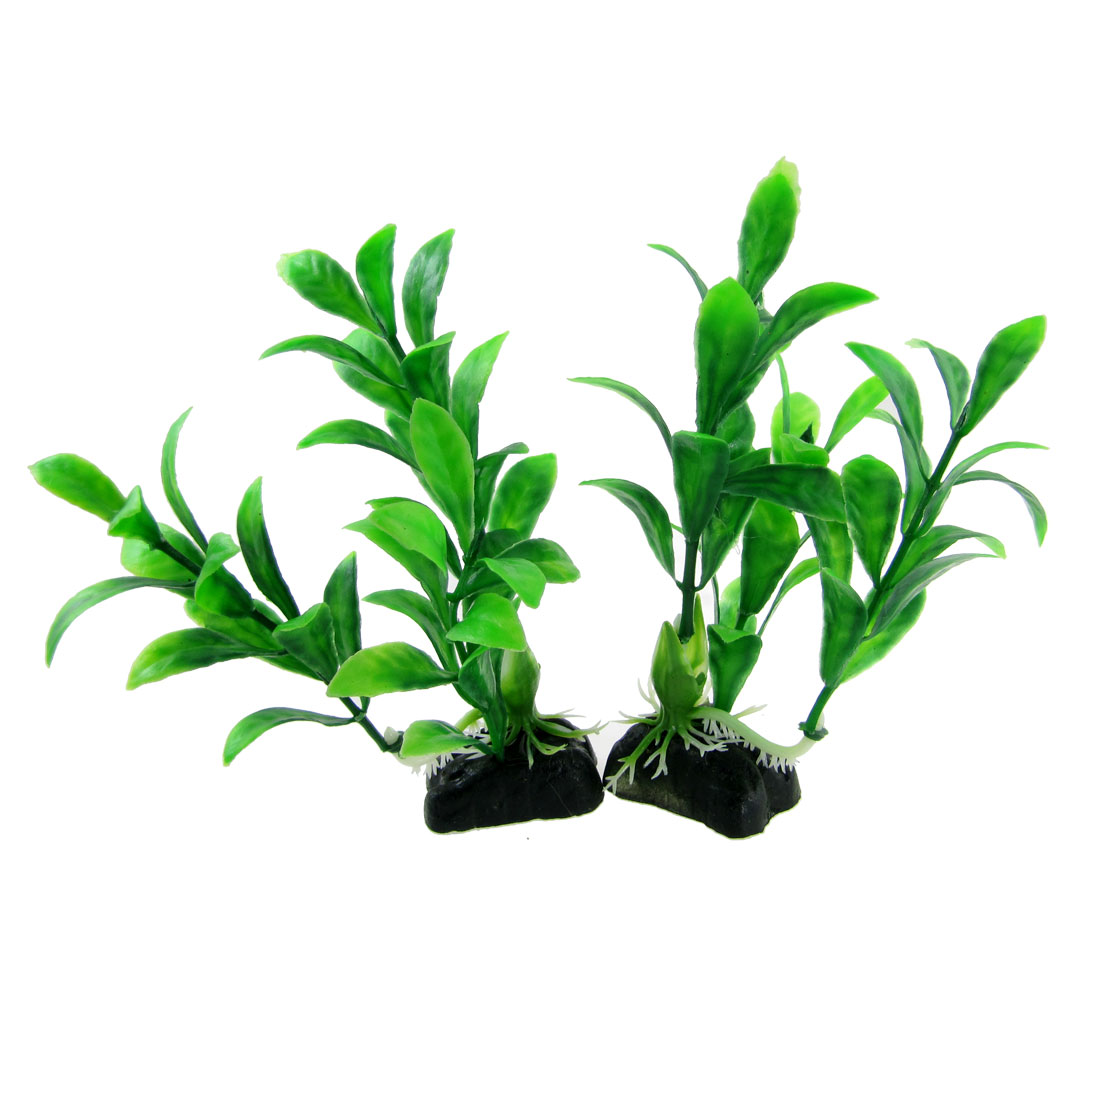 Aquarium-Fish-Tank-Green-Plastic-Plants-Decoration-2-6-x-4-9-2-Pcs